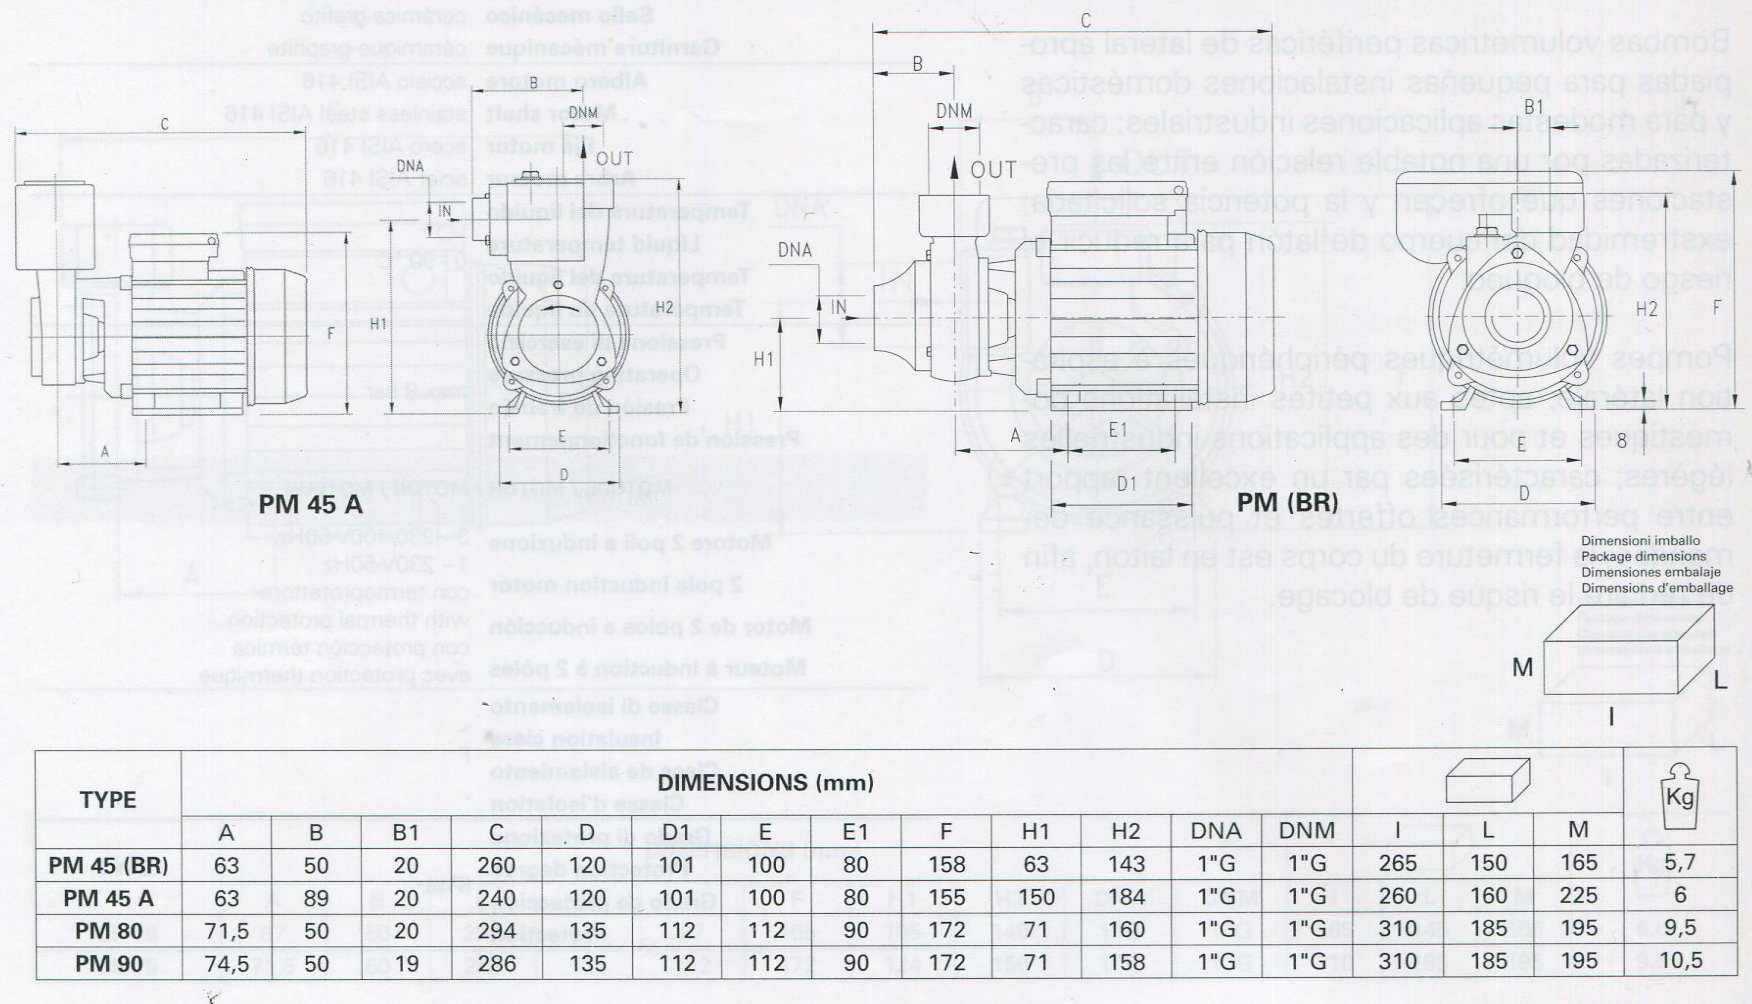 https://maybompentax.com.vn/images/2013/12/May-bom-pentax-trang17-duong-dac-tinh-02.jpg